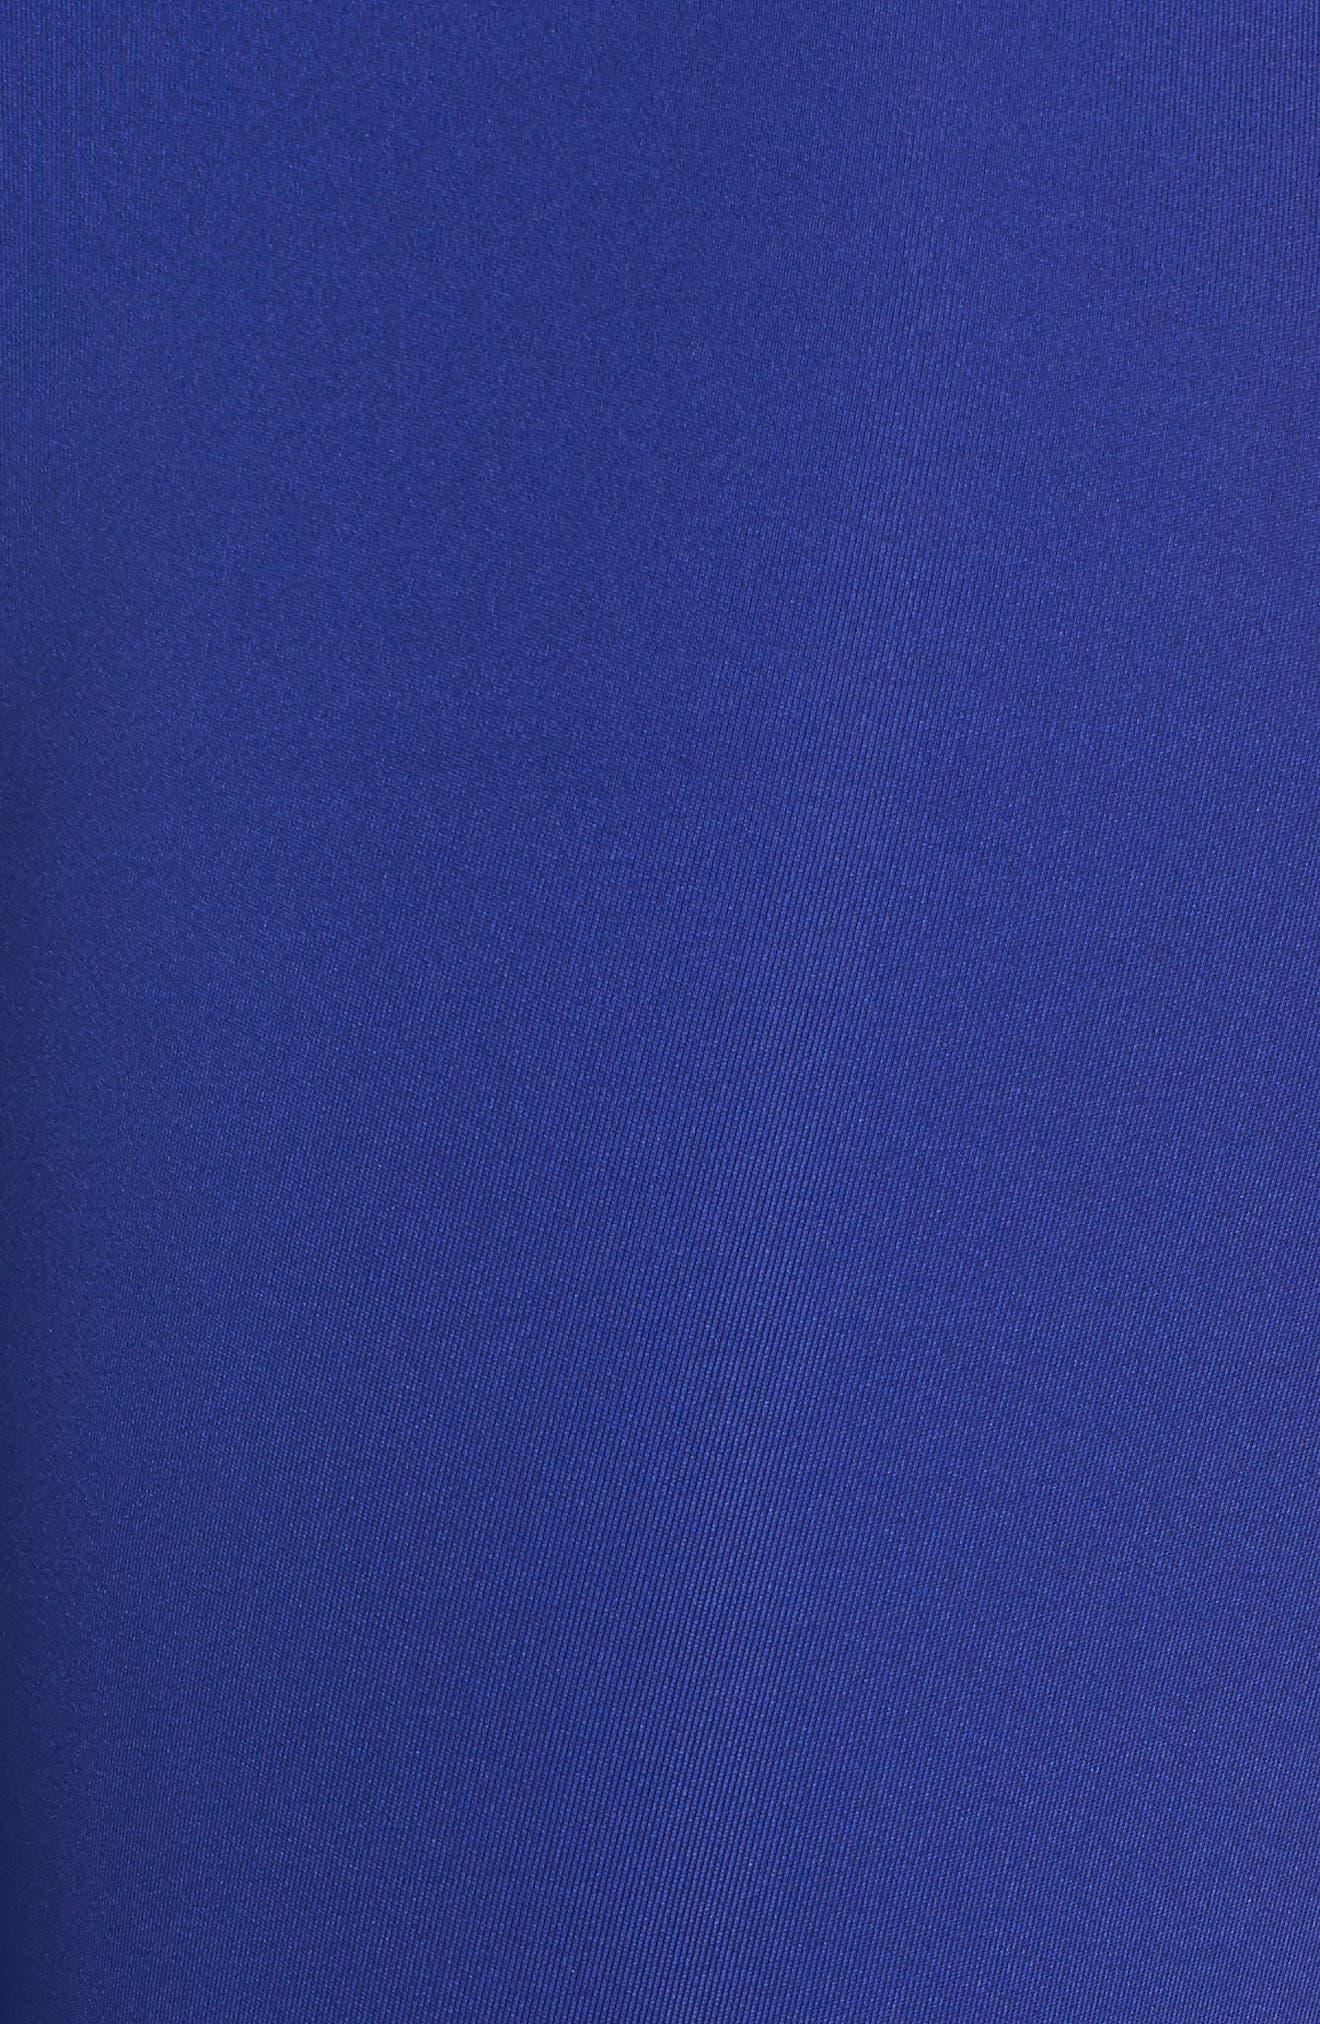 Breathelux Metallic Crop Studio Leggings,                             Alternate thumbnail 6, color,                             Formation Blue